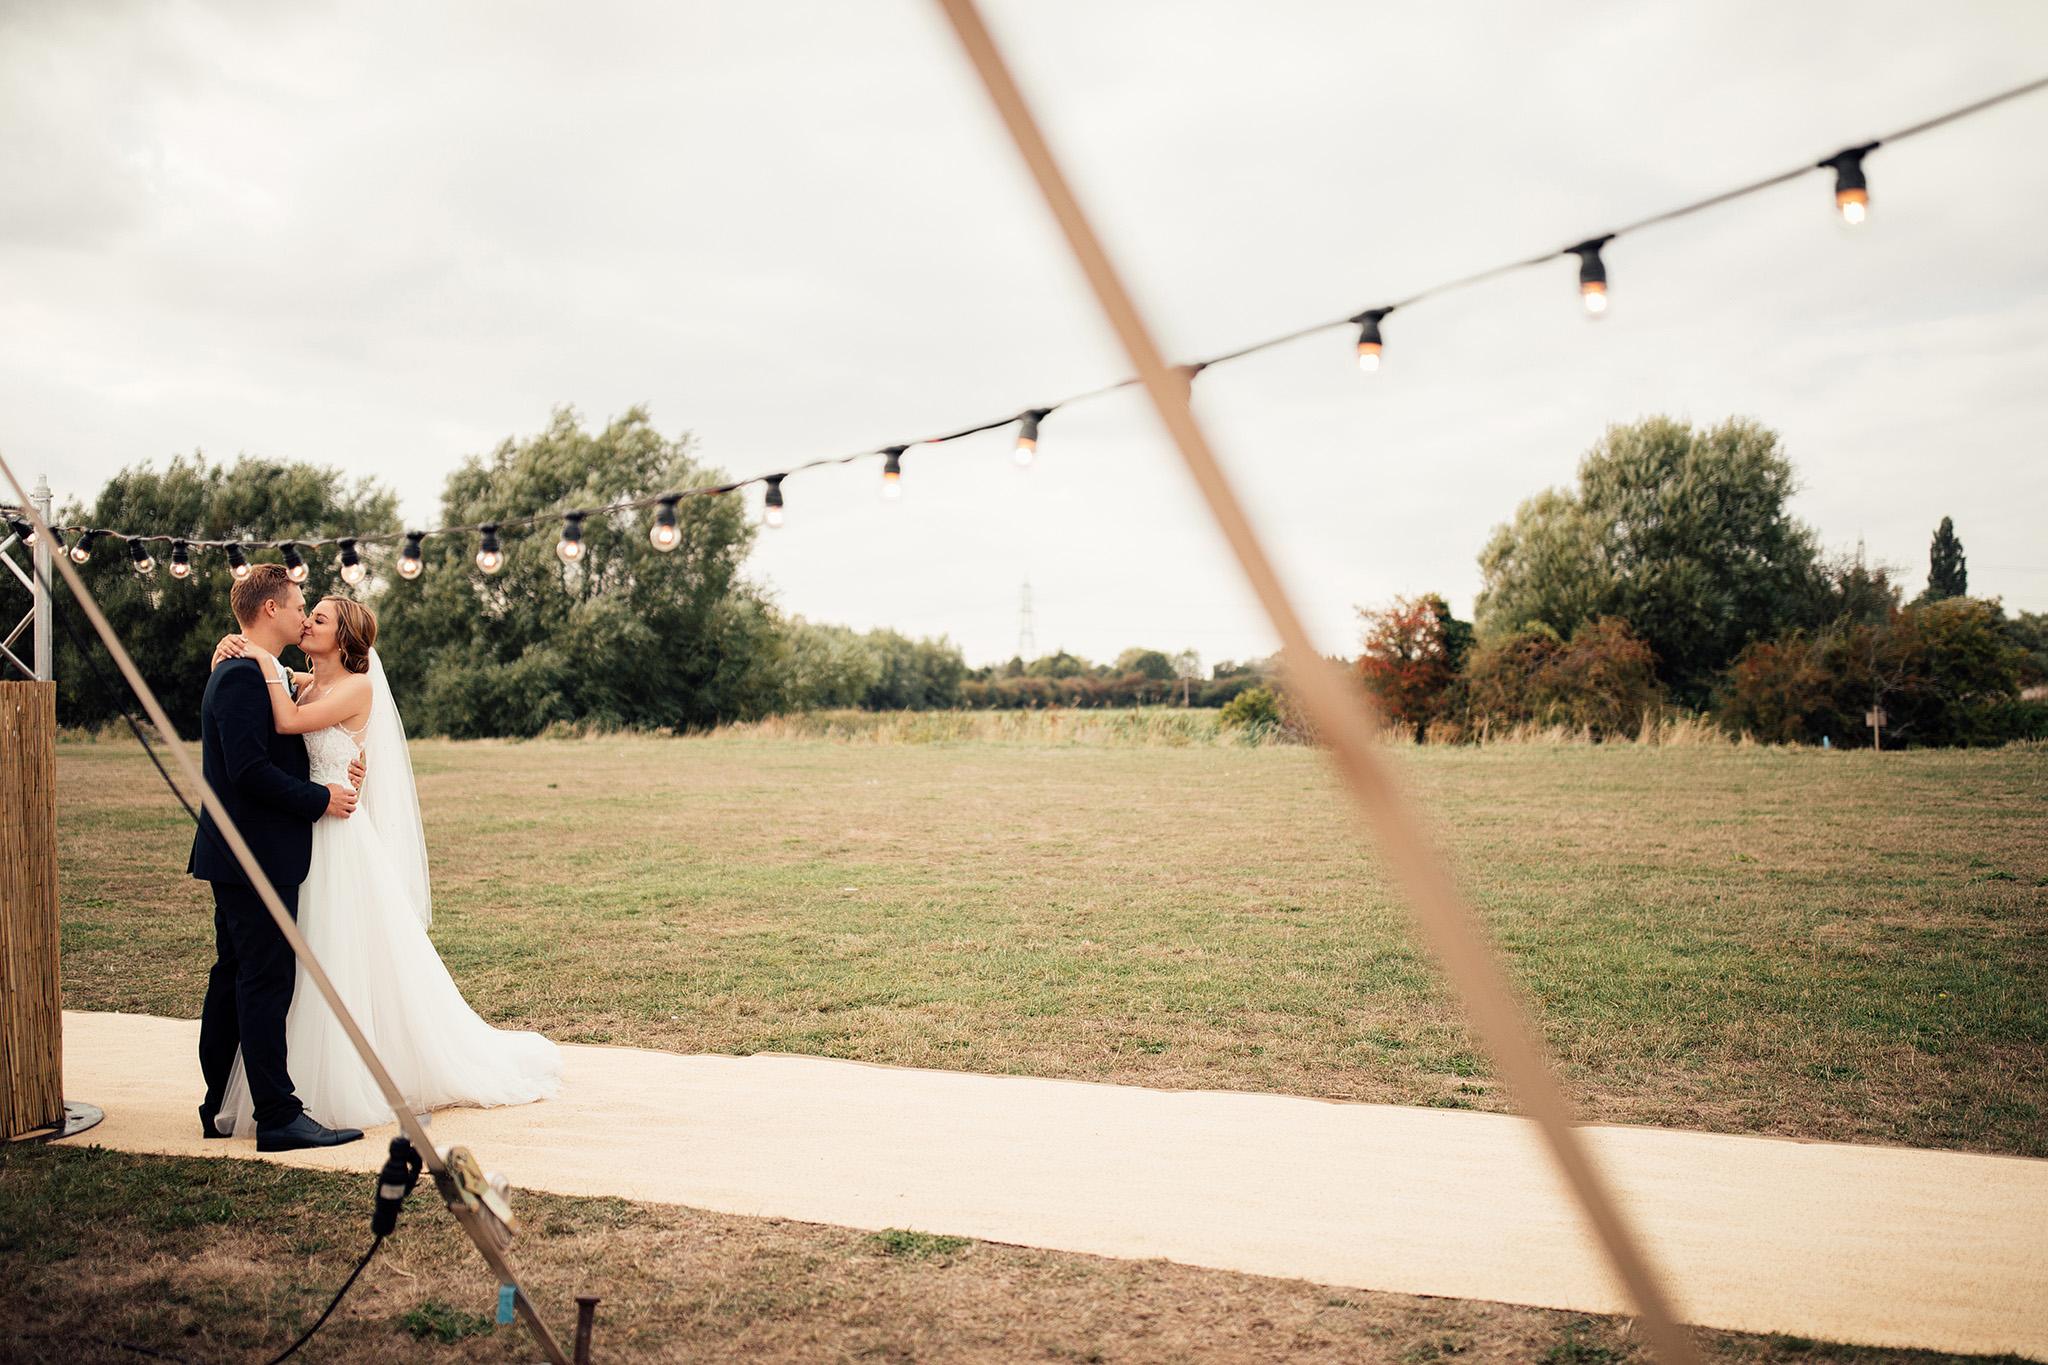 PapaKåta Sperry Wedding in Oxfordshire by Harry Michael Photography- Festoon Walkway